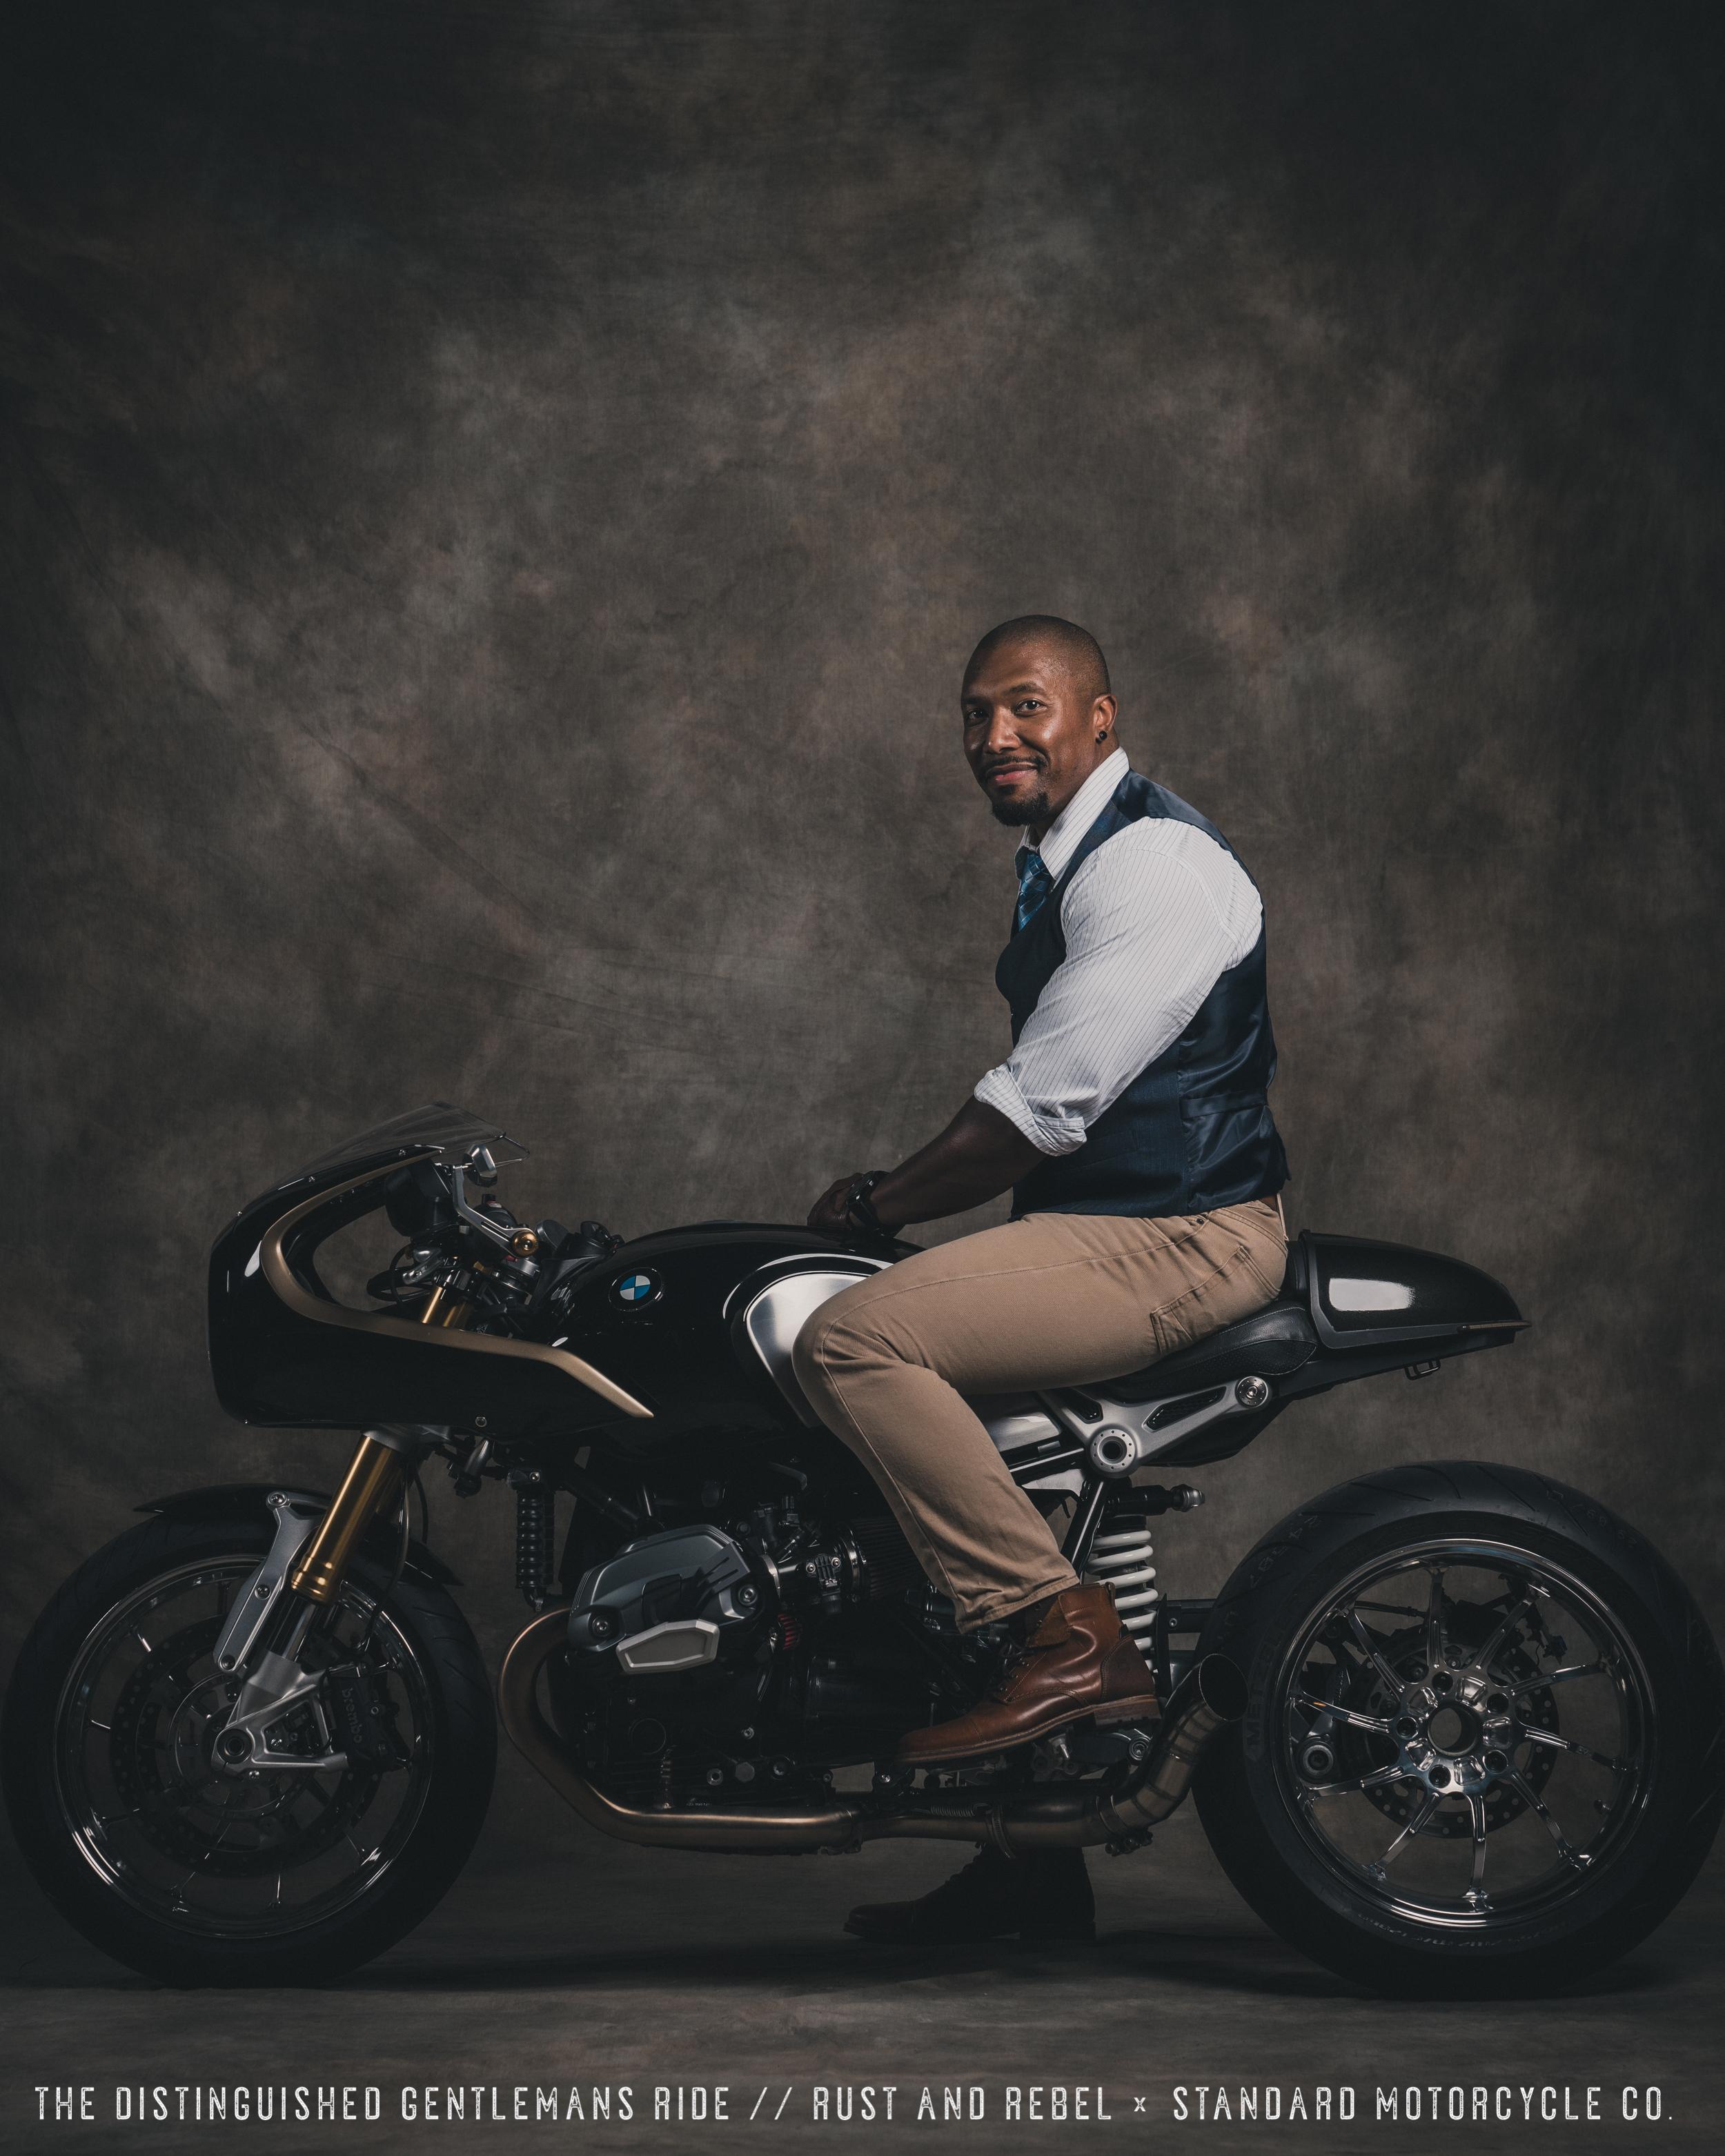 The Distinguished Gentleman's Ride 2019 [PEOPLE - PHOTO BY @MIKEDUNNUSA] - 0181.jpg